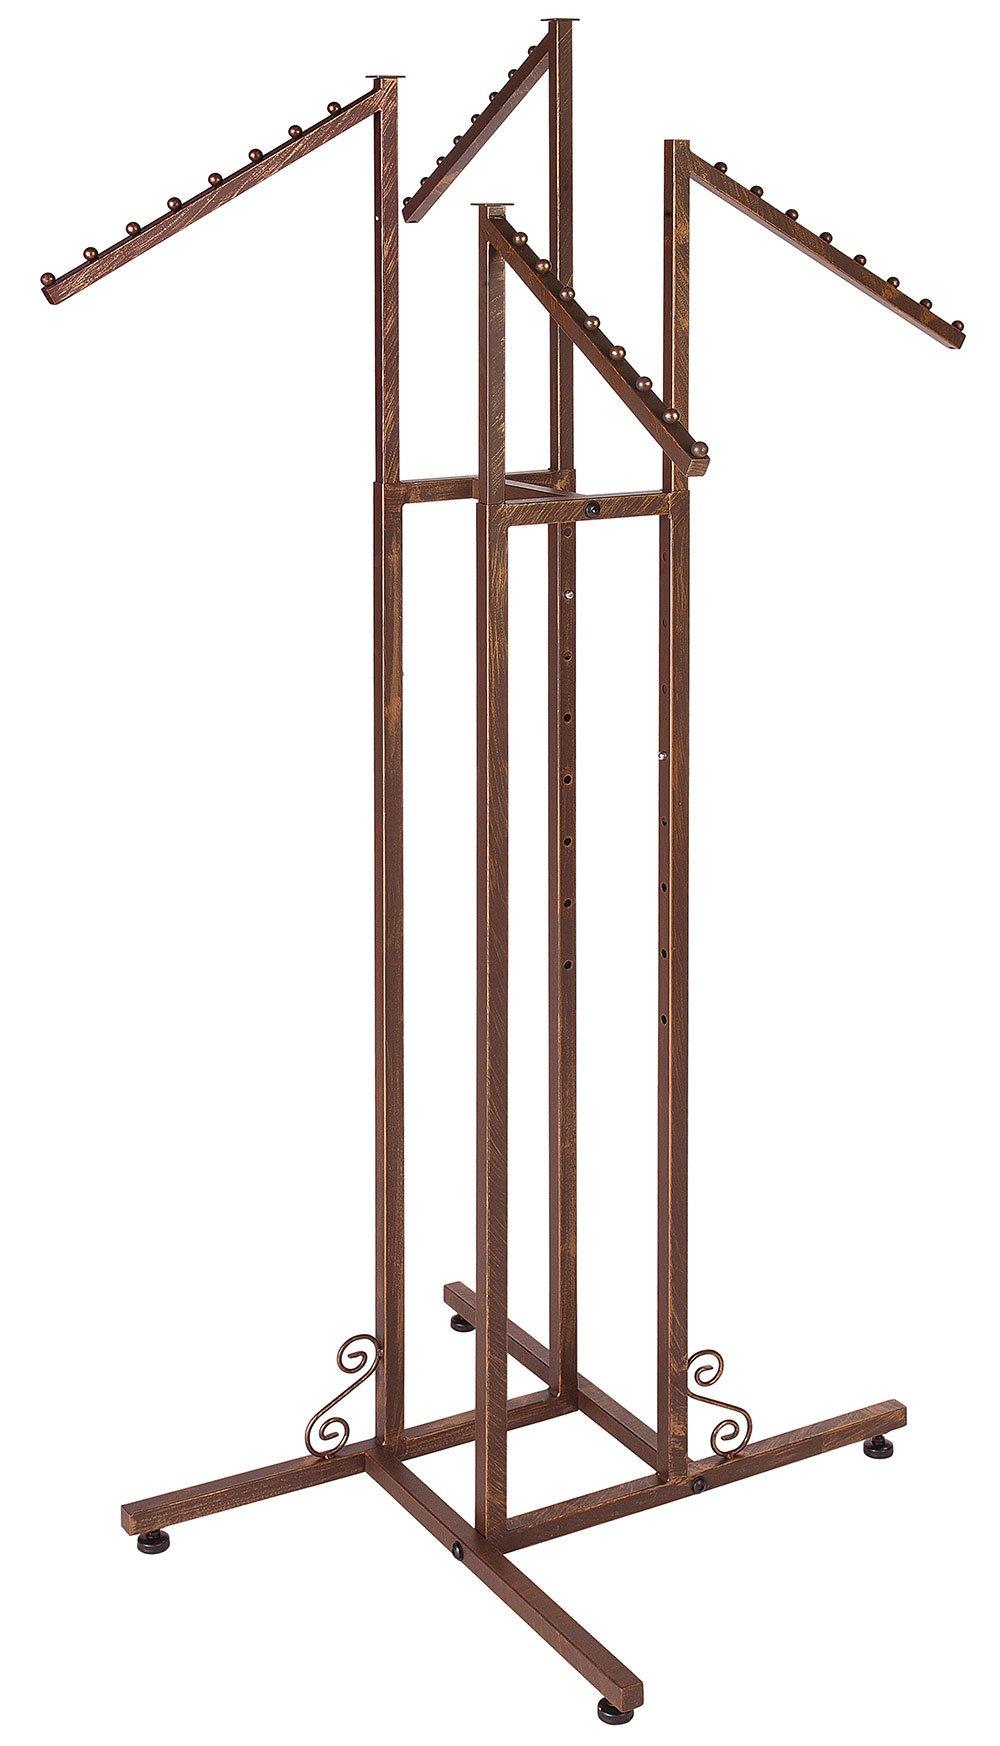 SSWBasics 4-Way Clothing Rack with Slant Arms (Boutique Cobblestone) Heavy Duty Rack